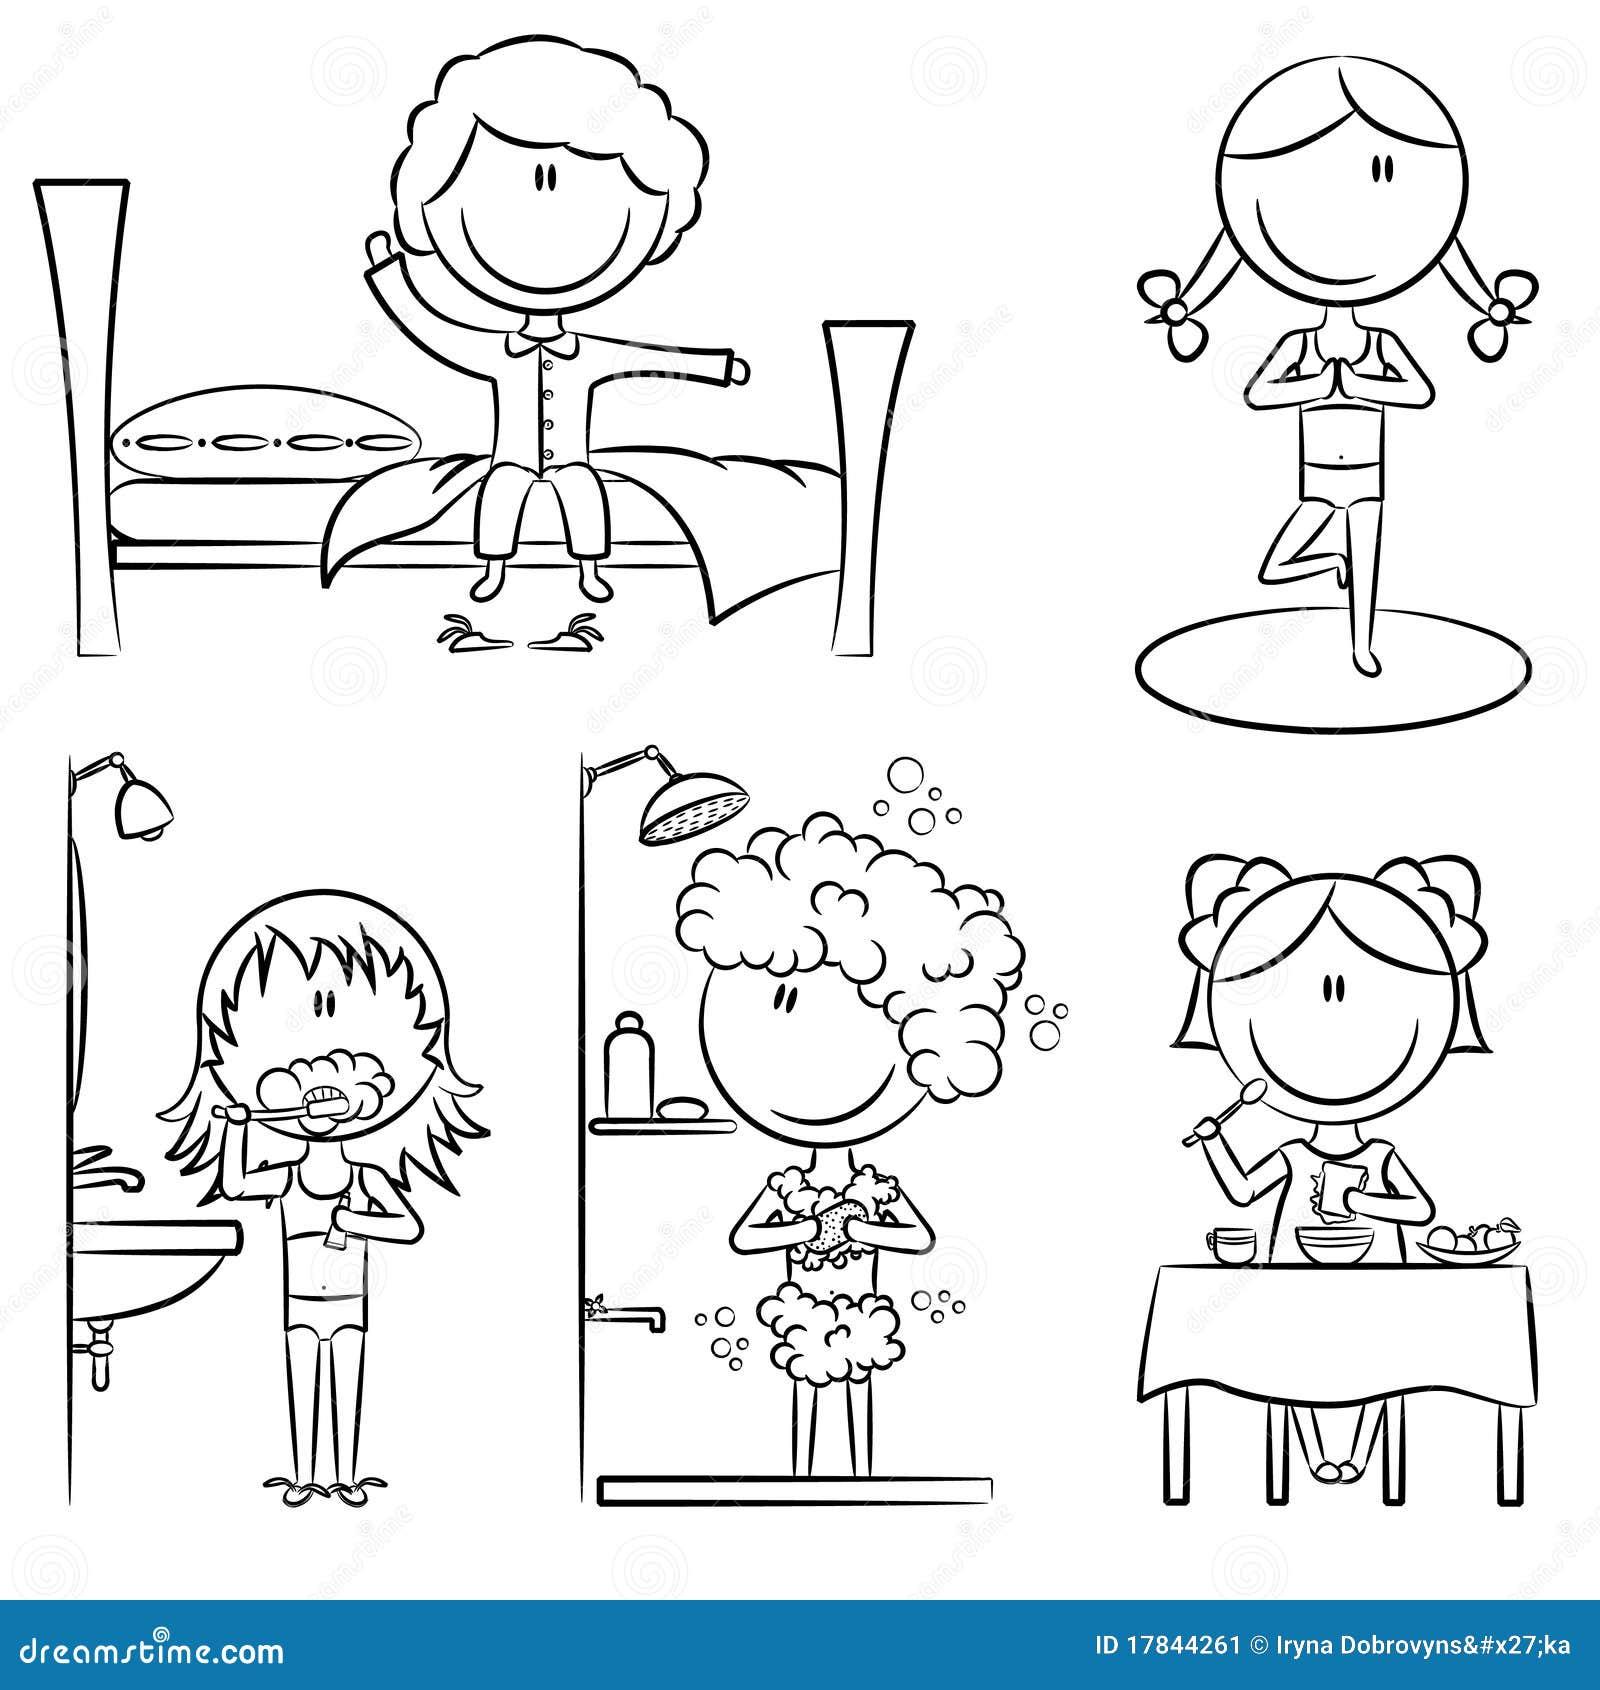 Daily Morning Girls Life Stock Image - Image: 17844261